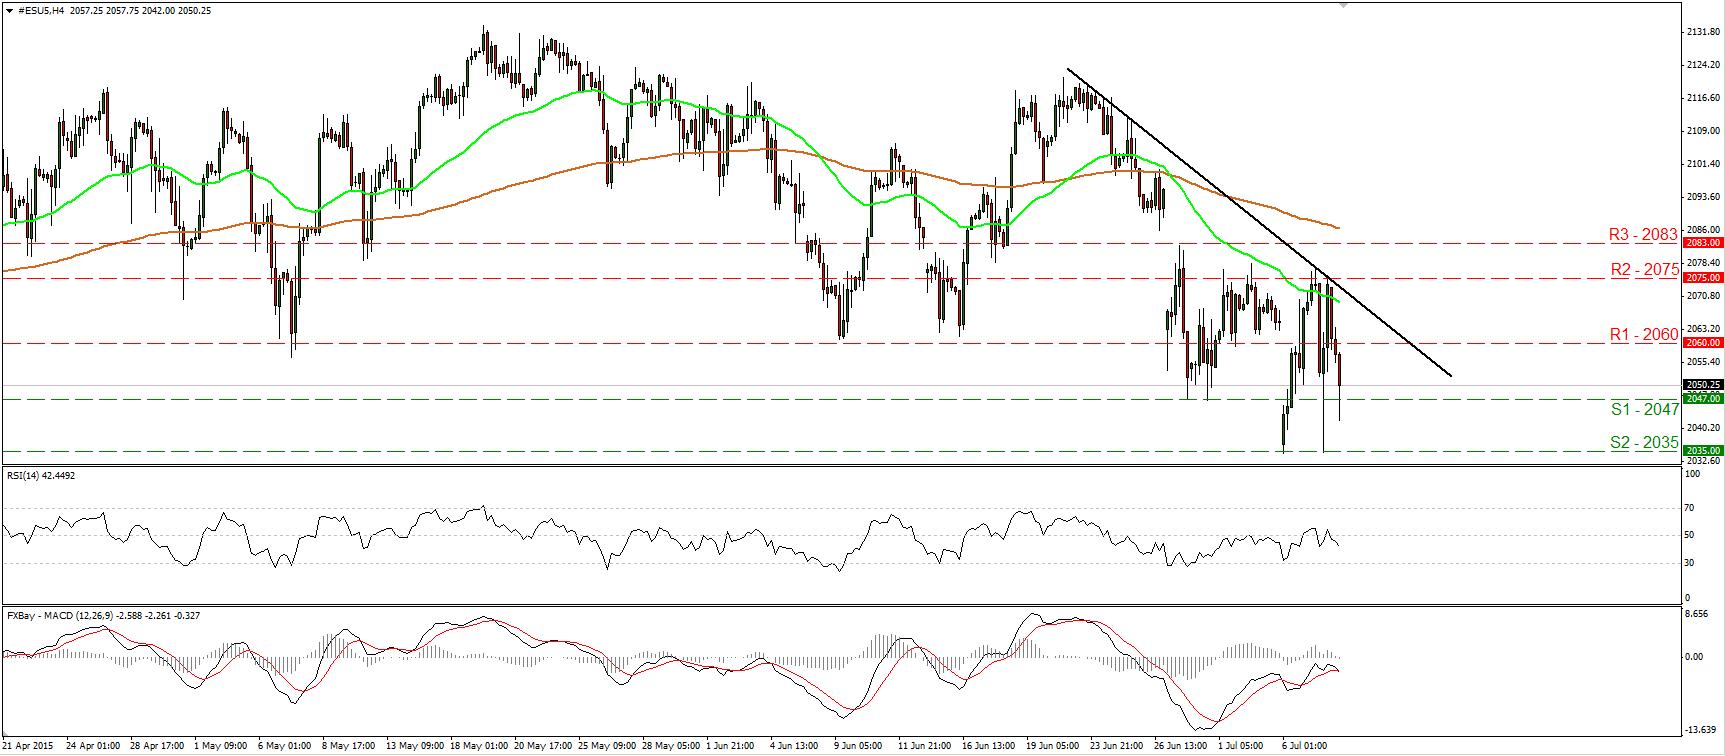 S&P500_08July2015